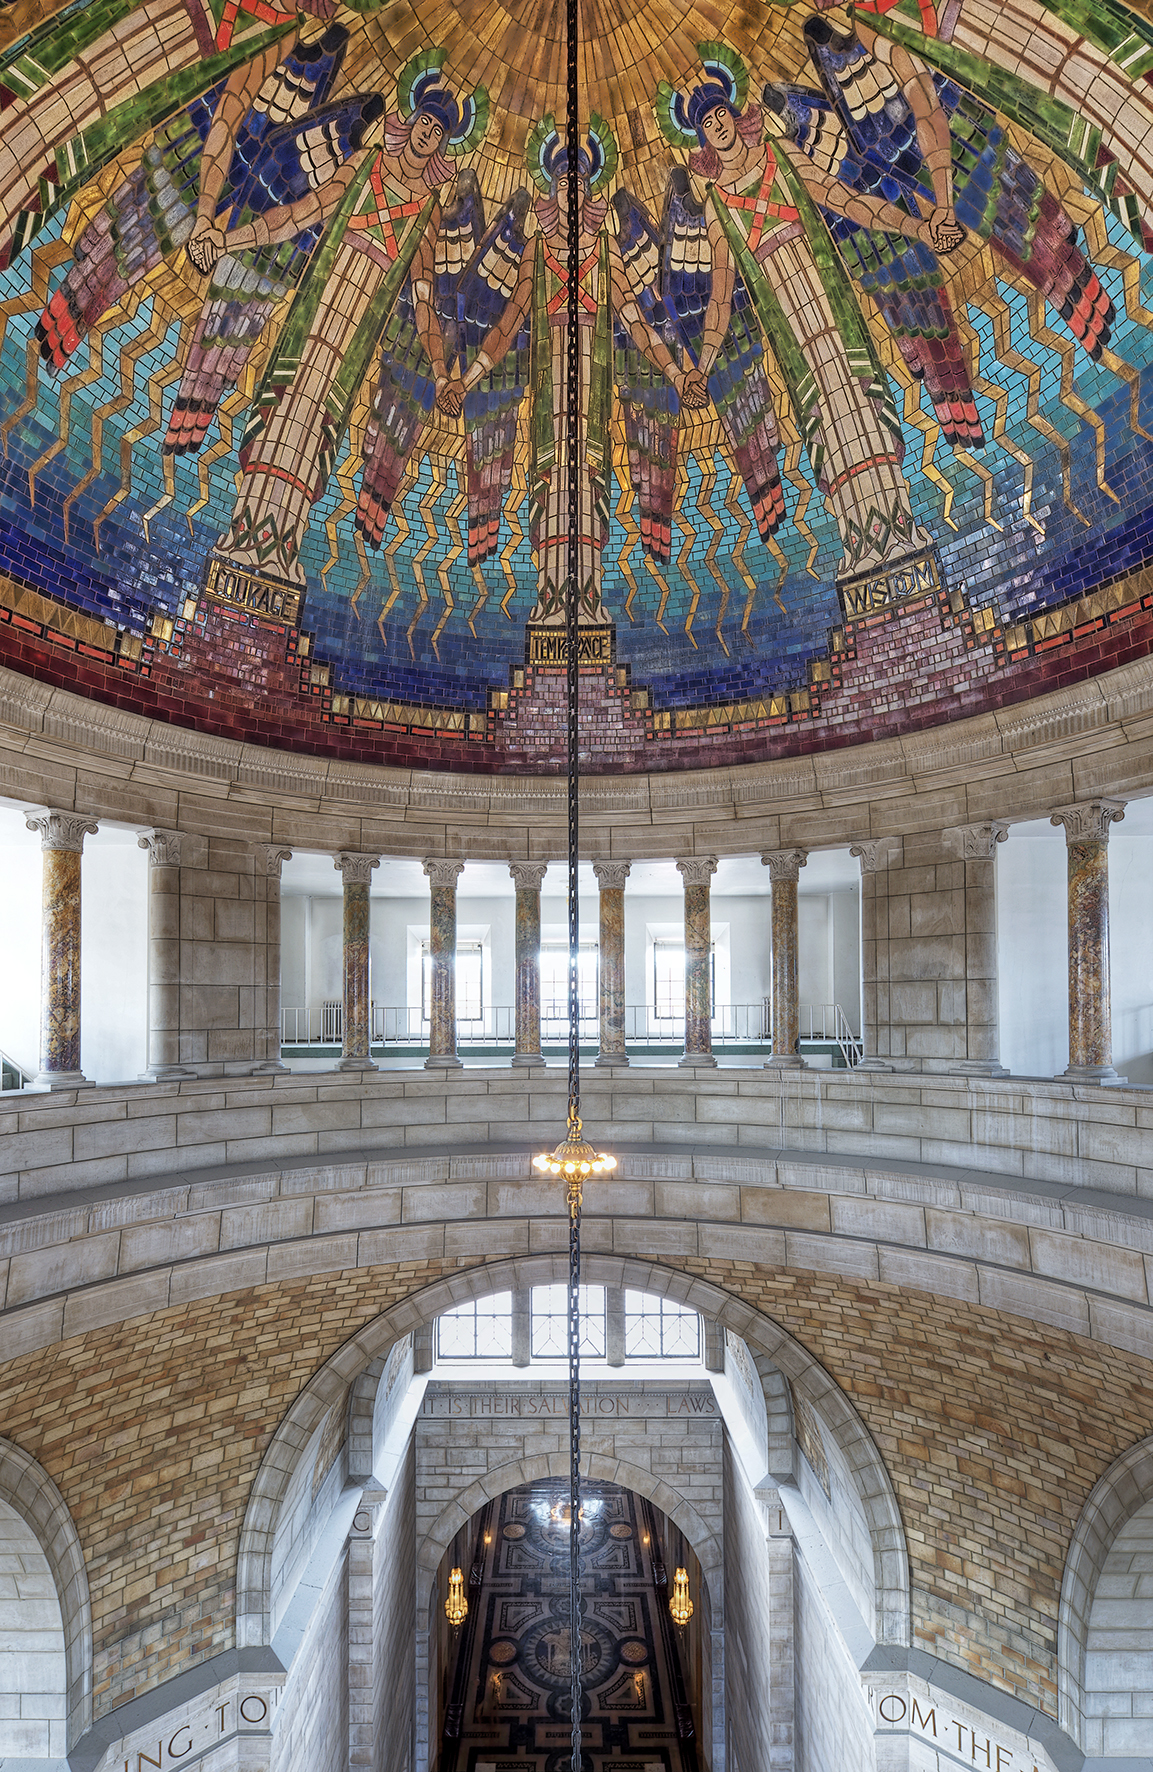 View of the rotunda inside the Nebraska State Capitol building